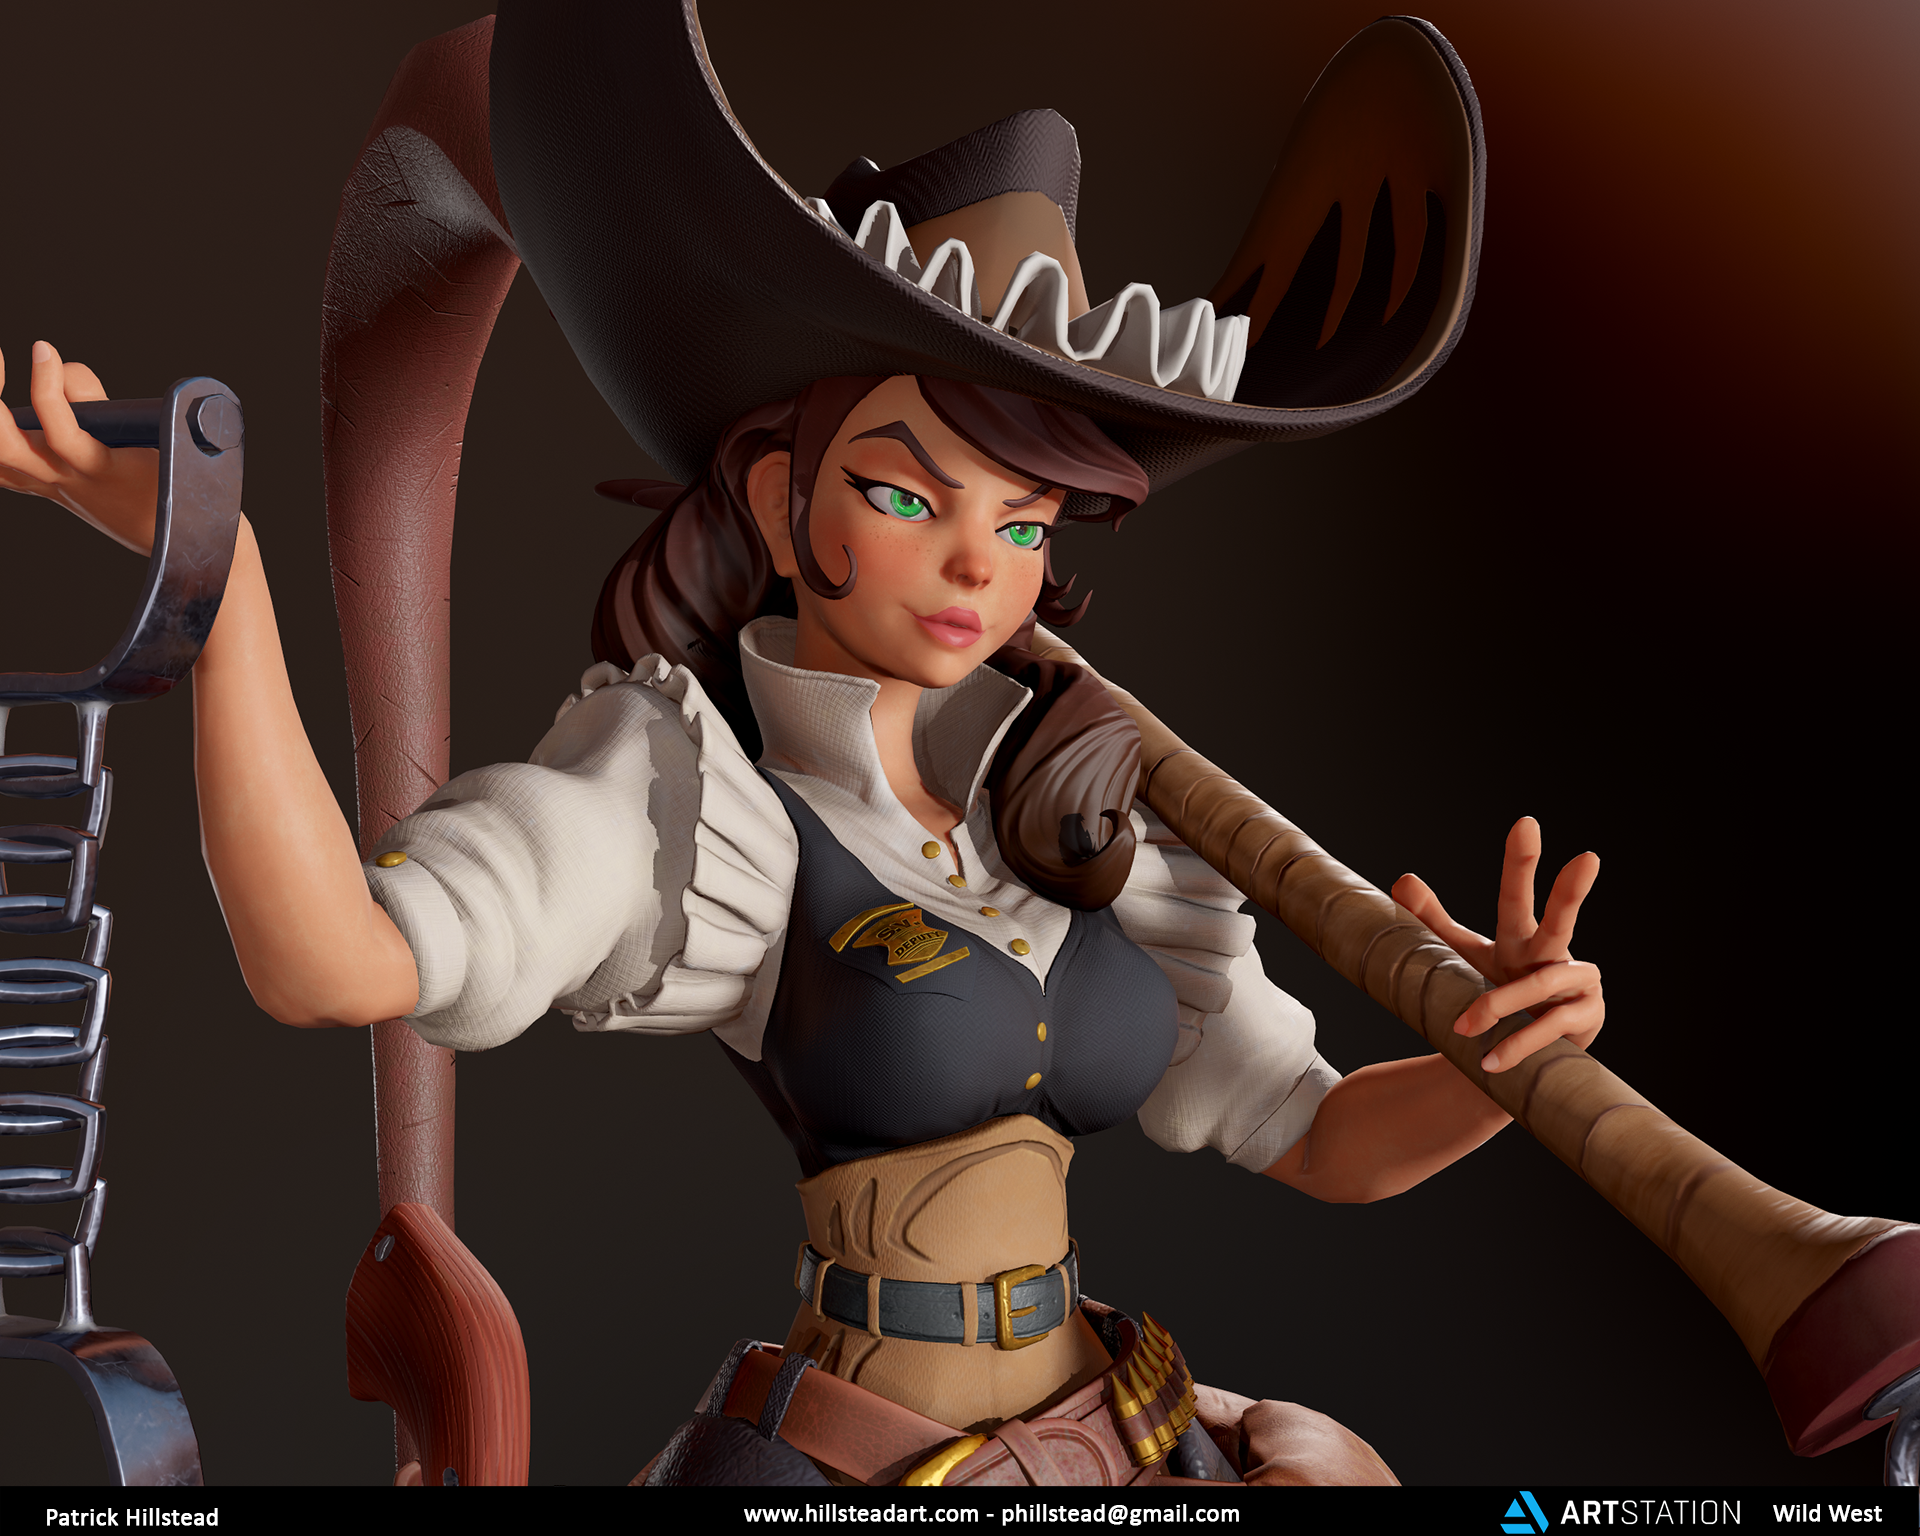 Wild West Challenge - Helen the Deputy